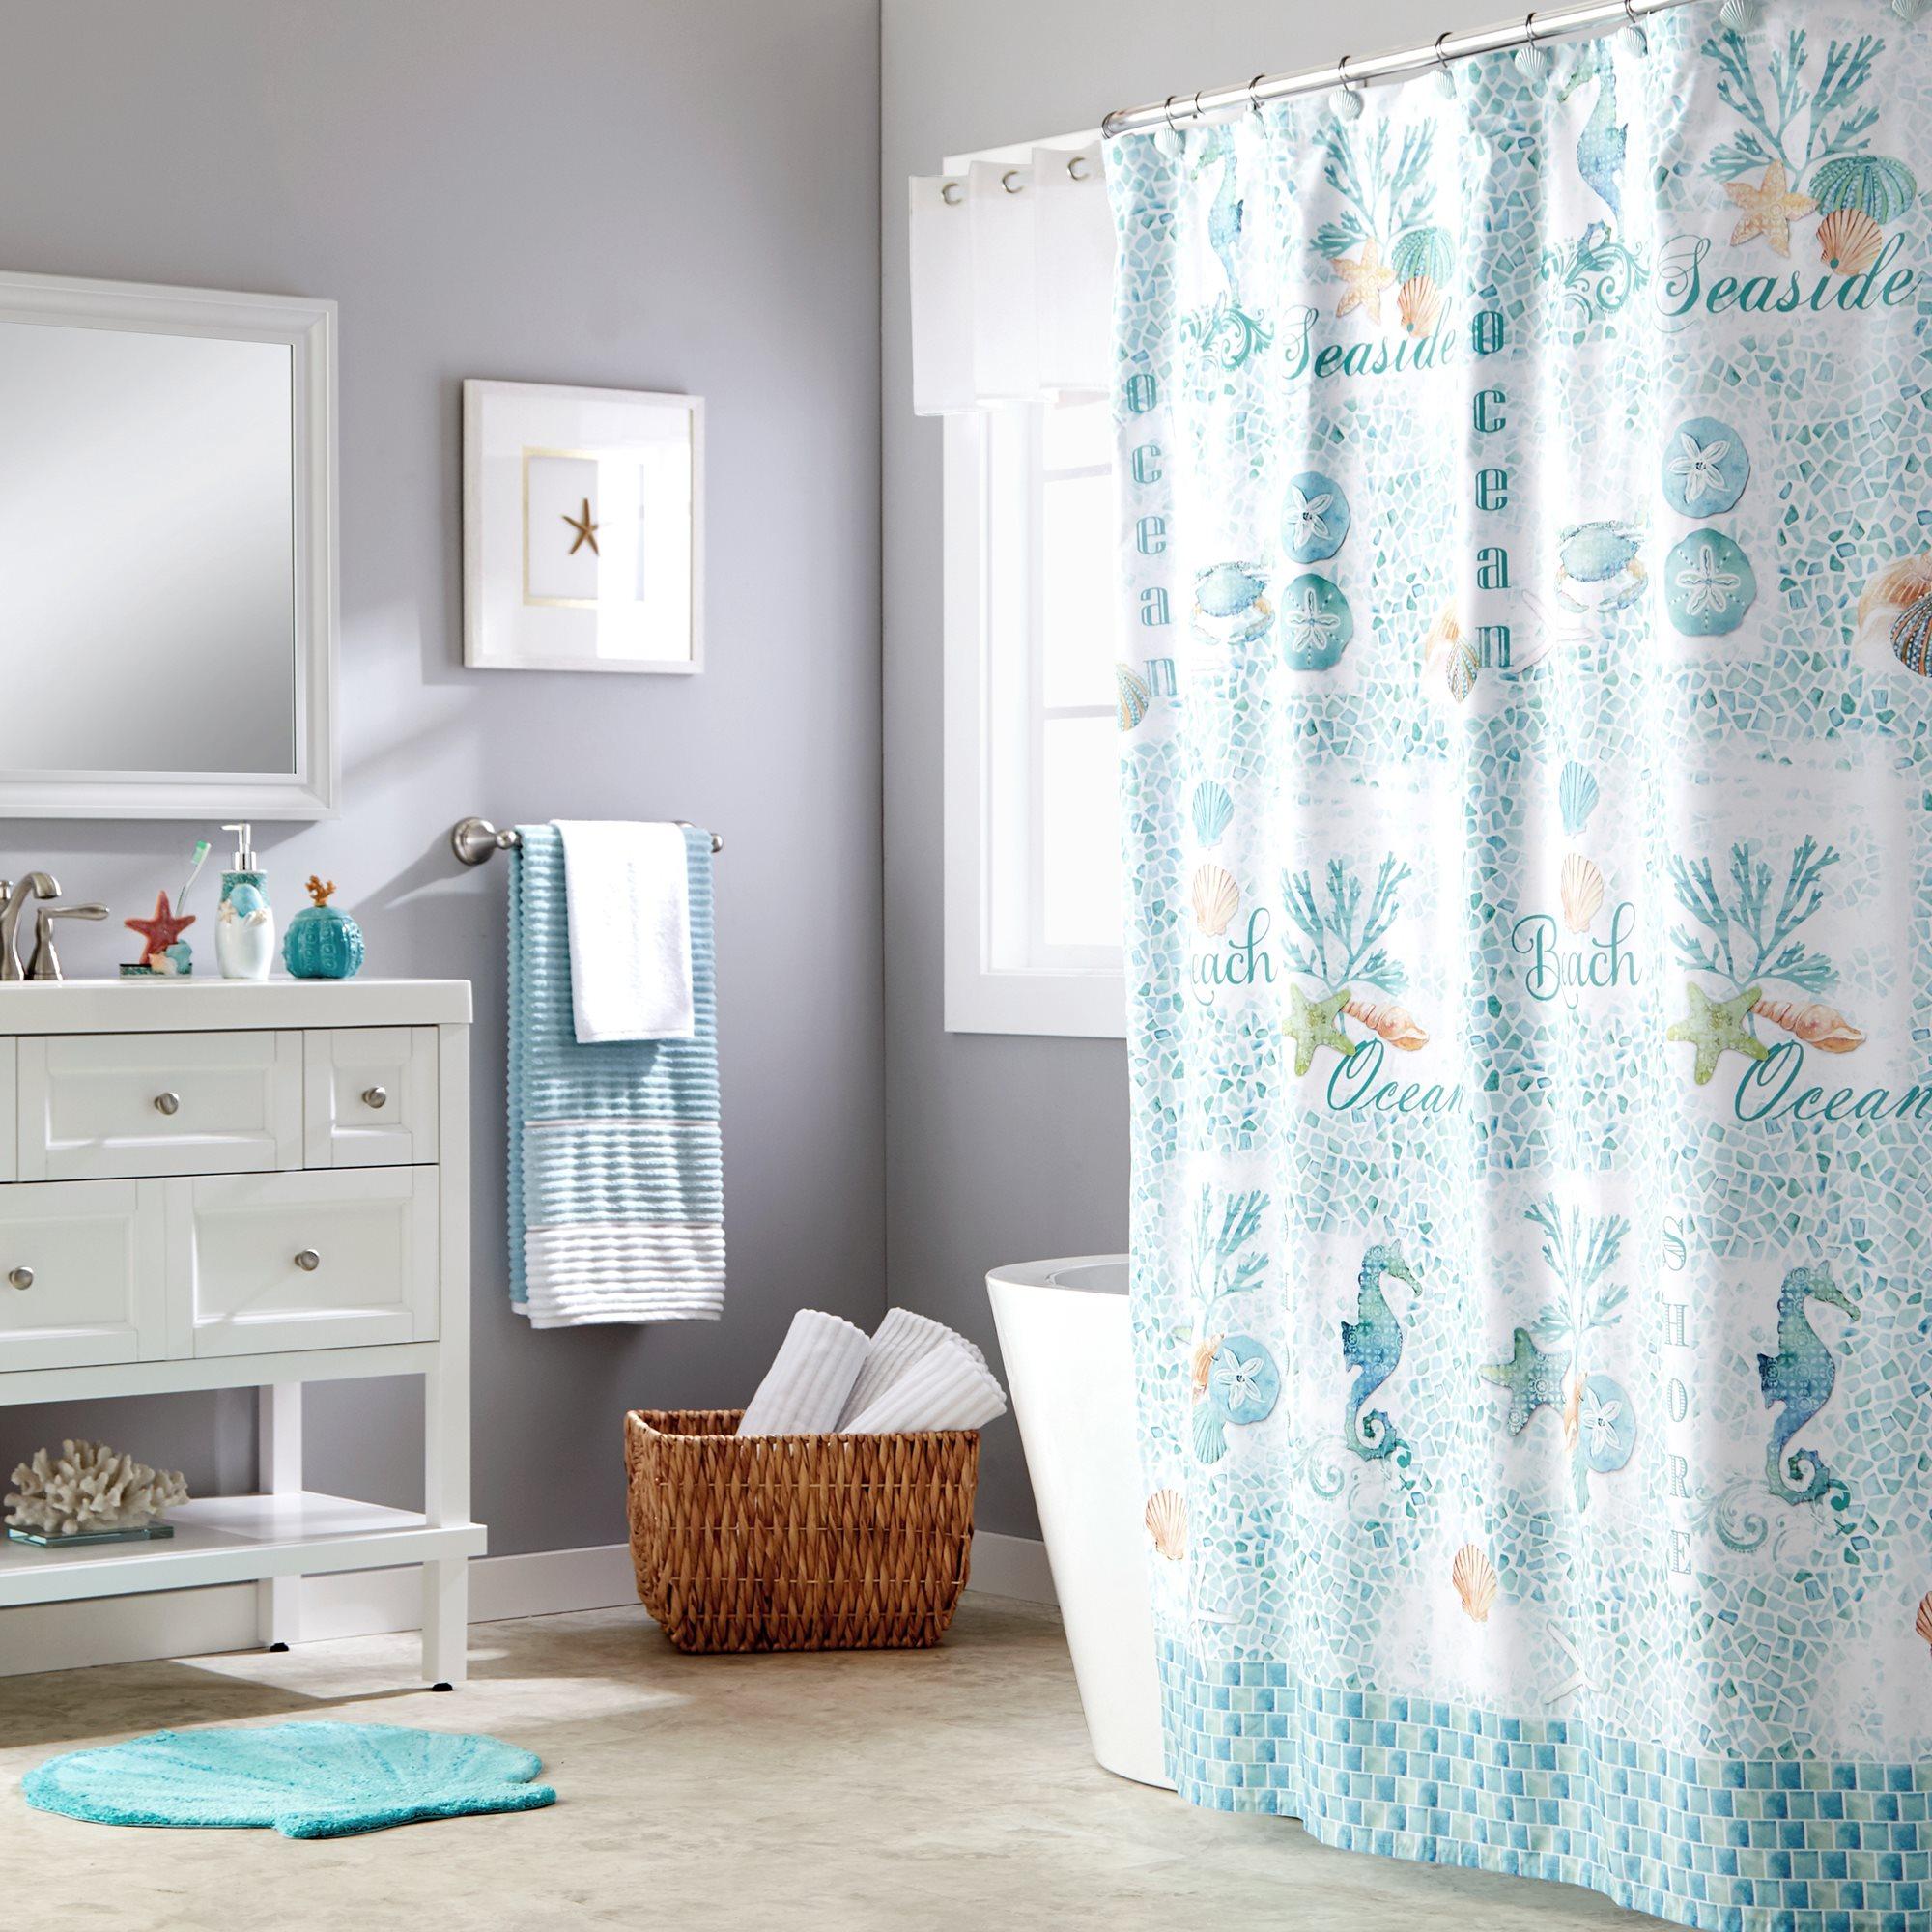 Details About Saturday Knight Ltd South Seas Beach Life Fabric Bath Shower Curtain 70x72 Teal